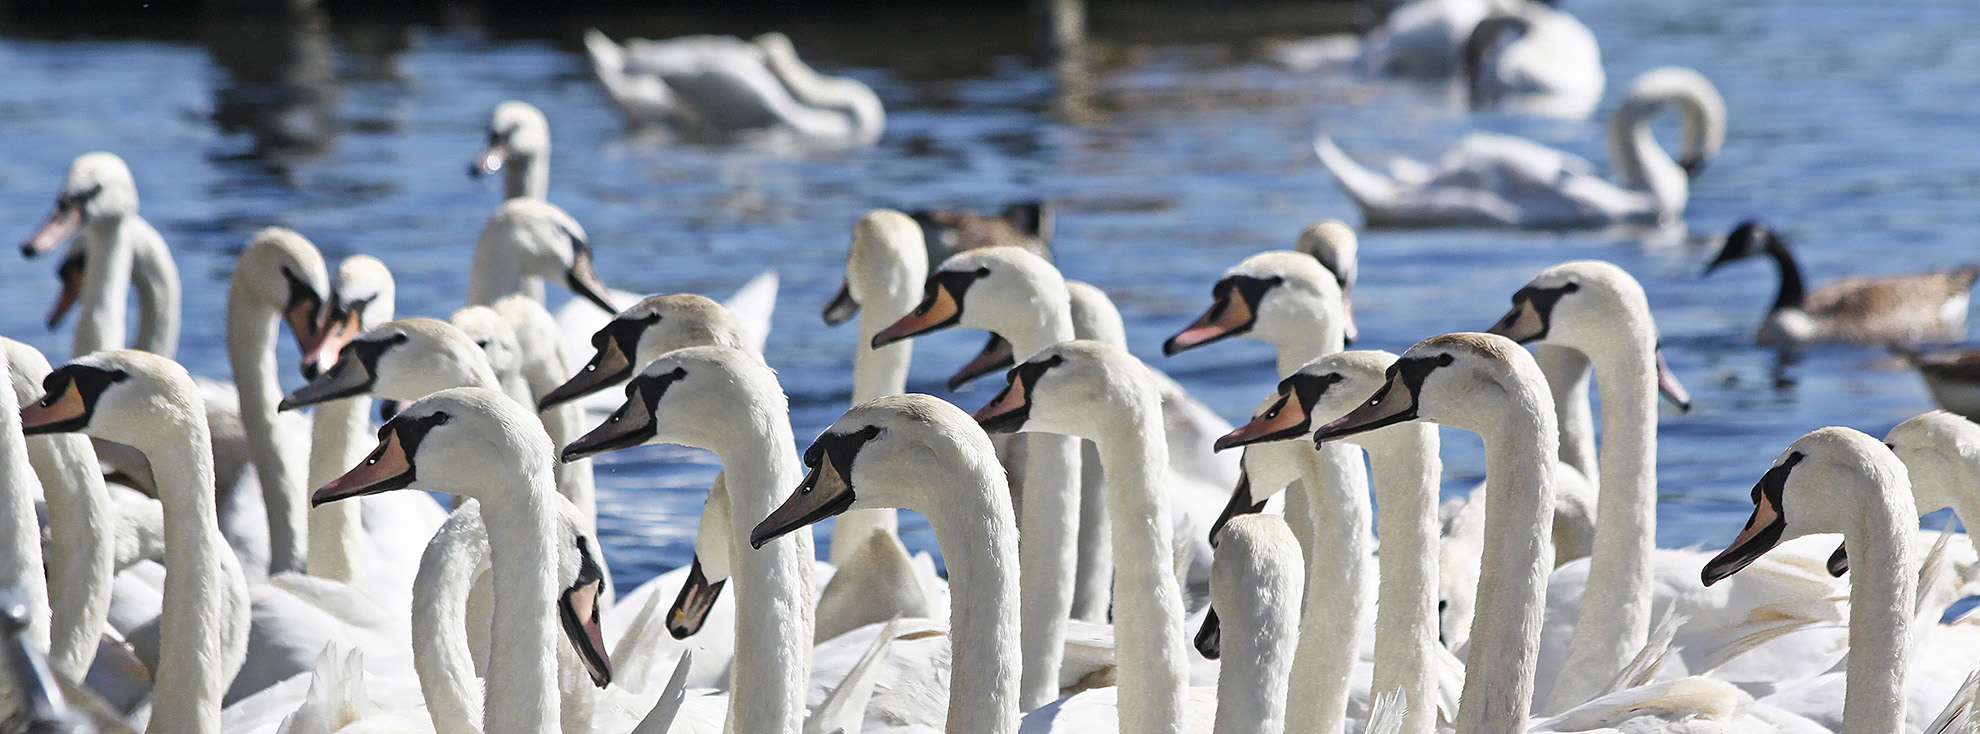 Swans in Kingston.jpg